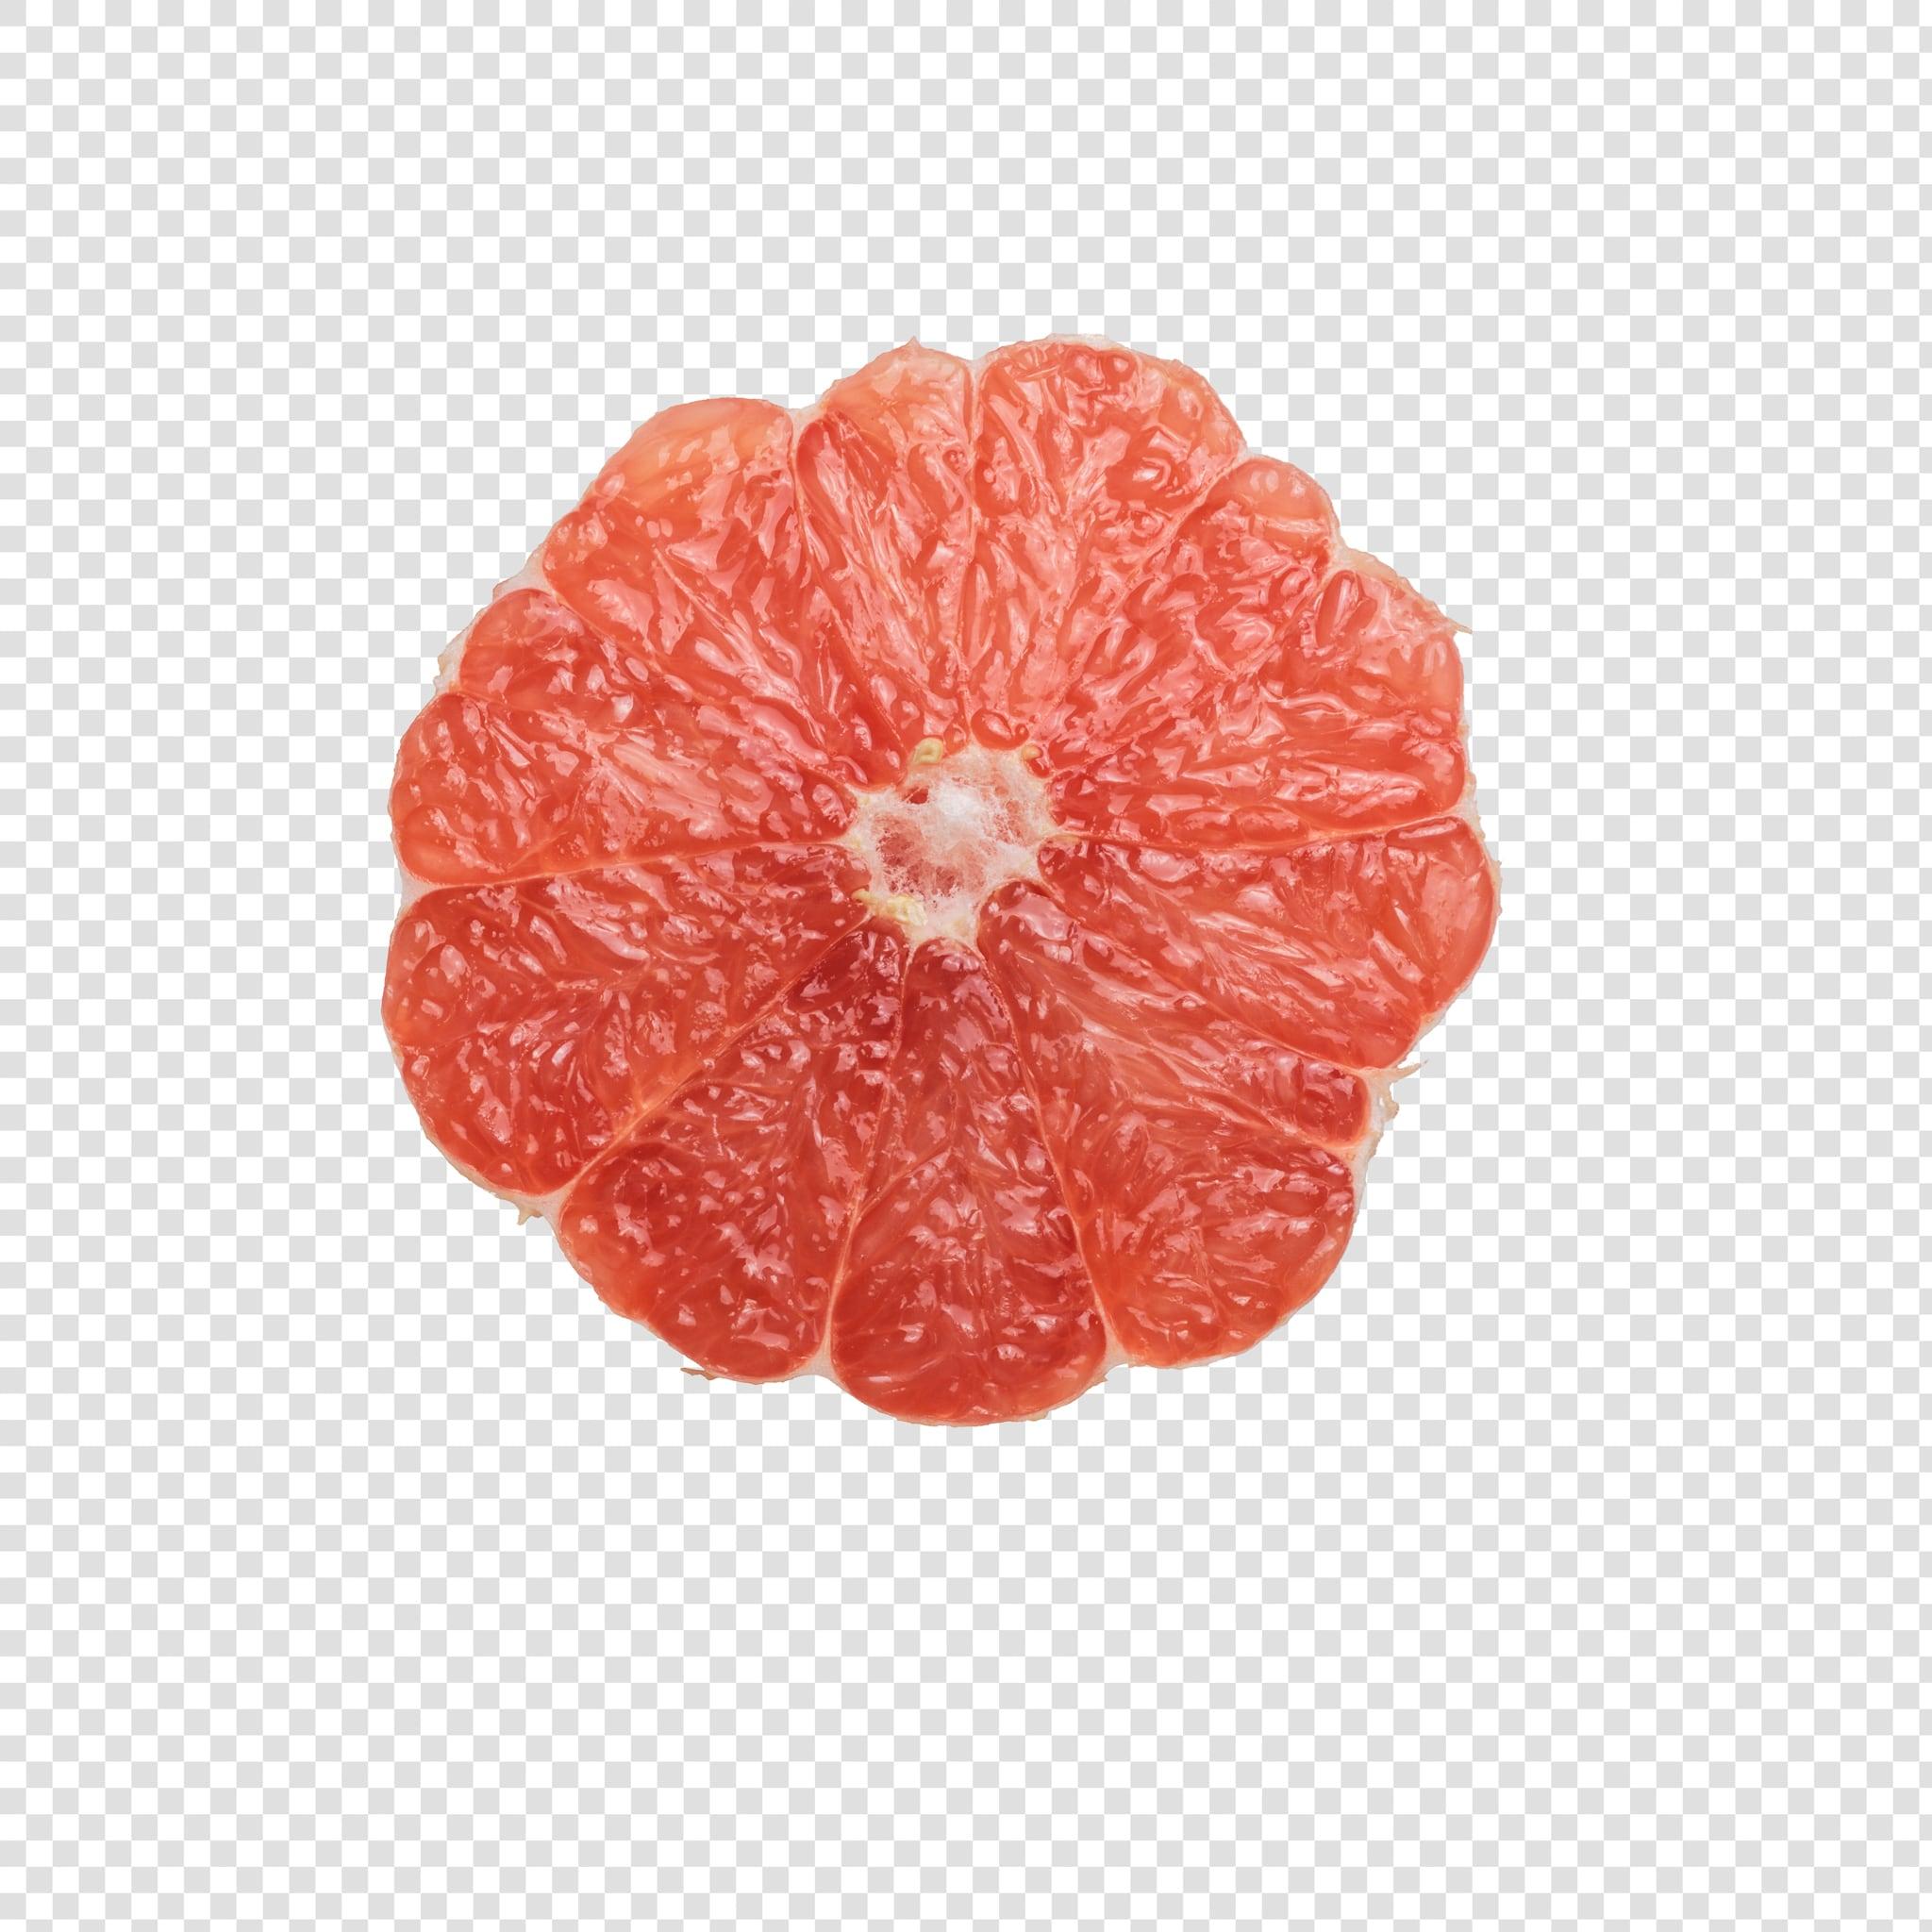 Grapefruit PSD isolated image